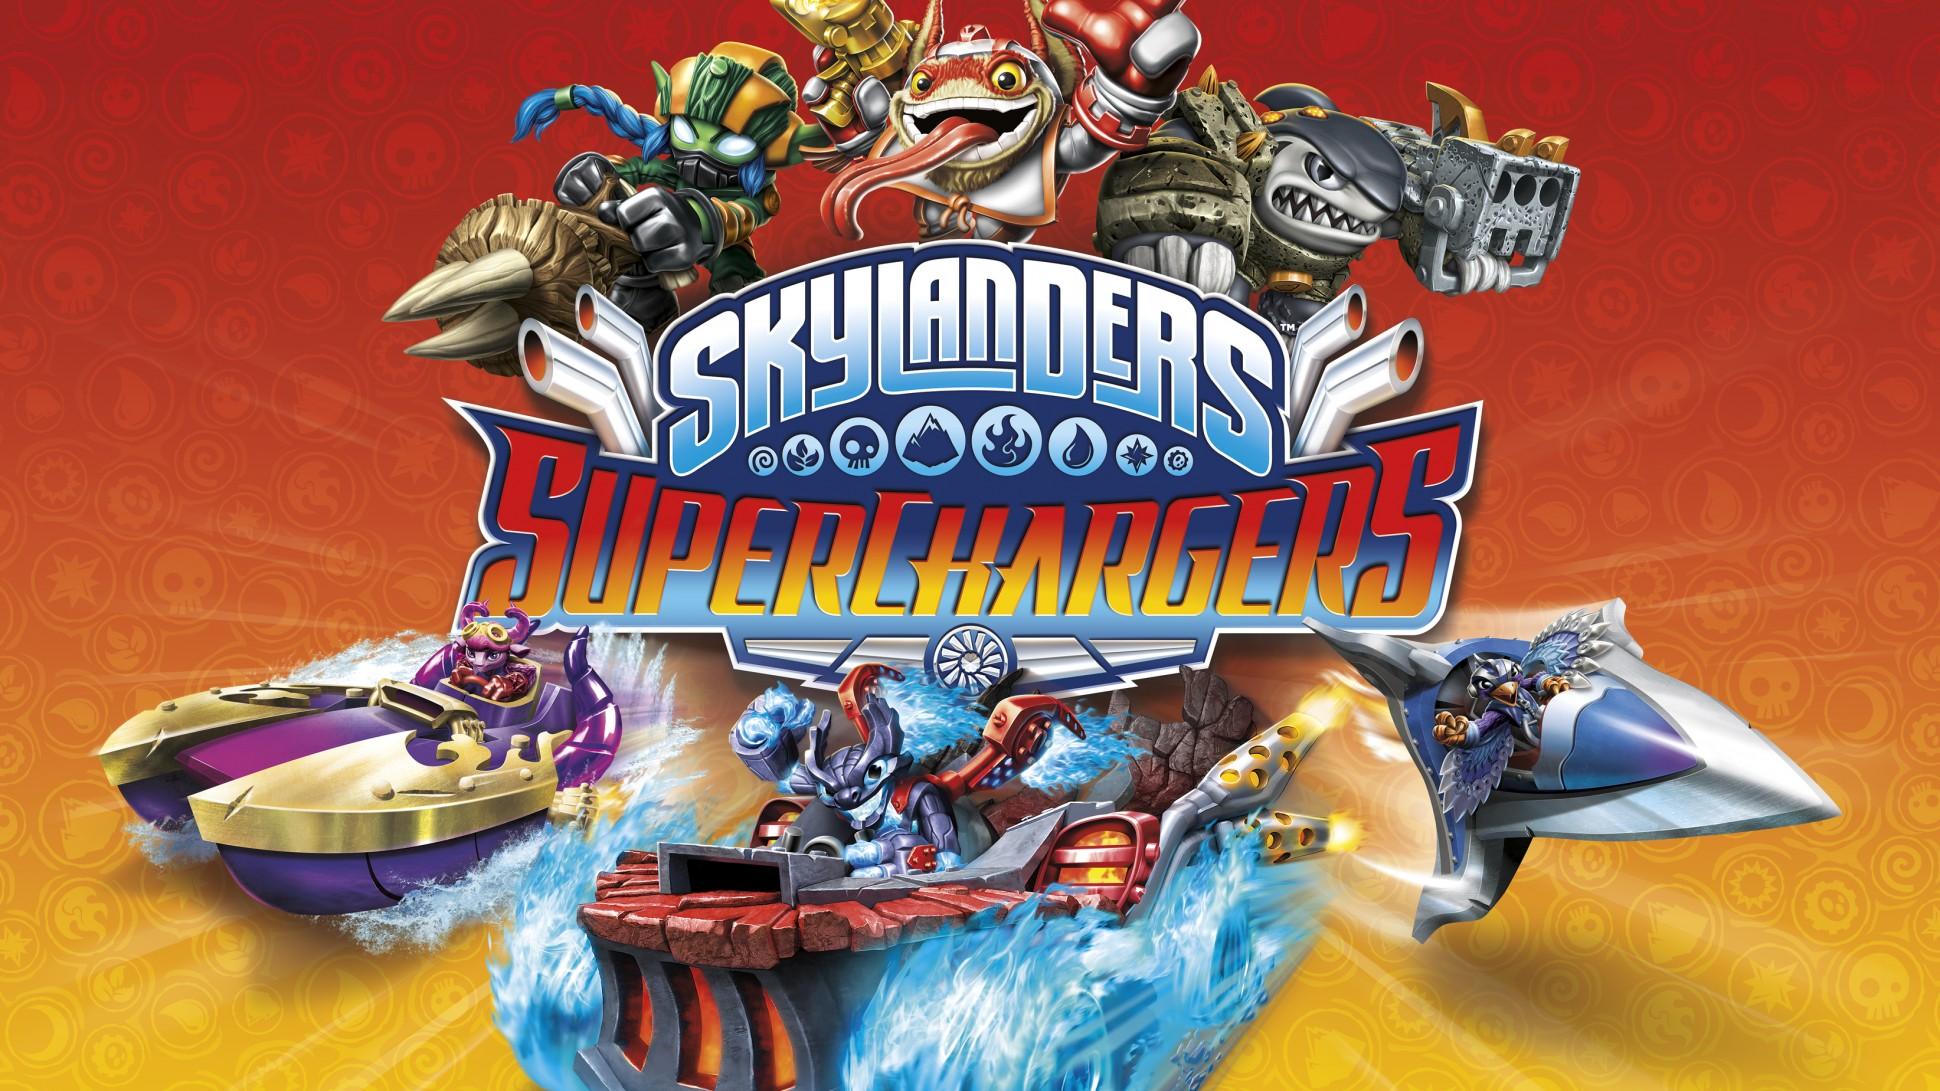 Skylanders-SuperChargers-Key-Art-e1433362844262-1940x1091